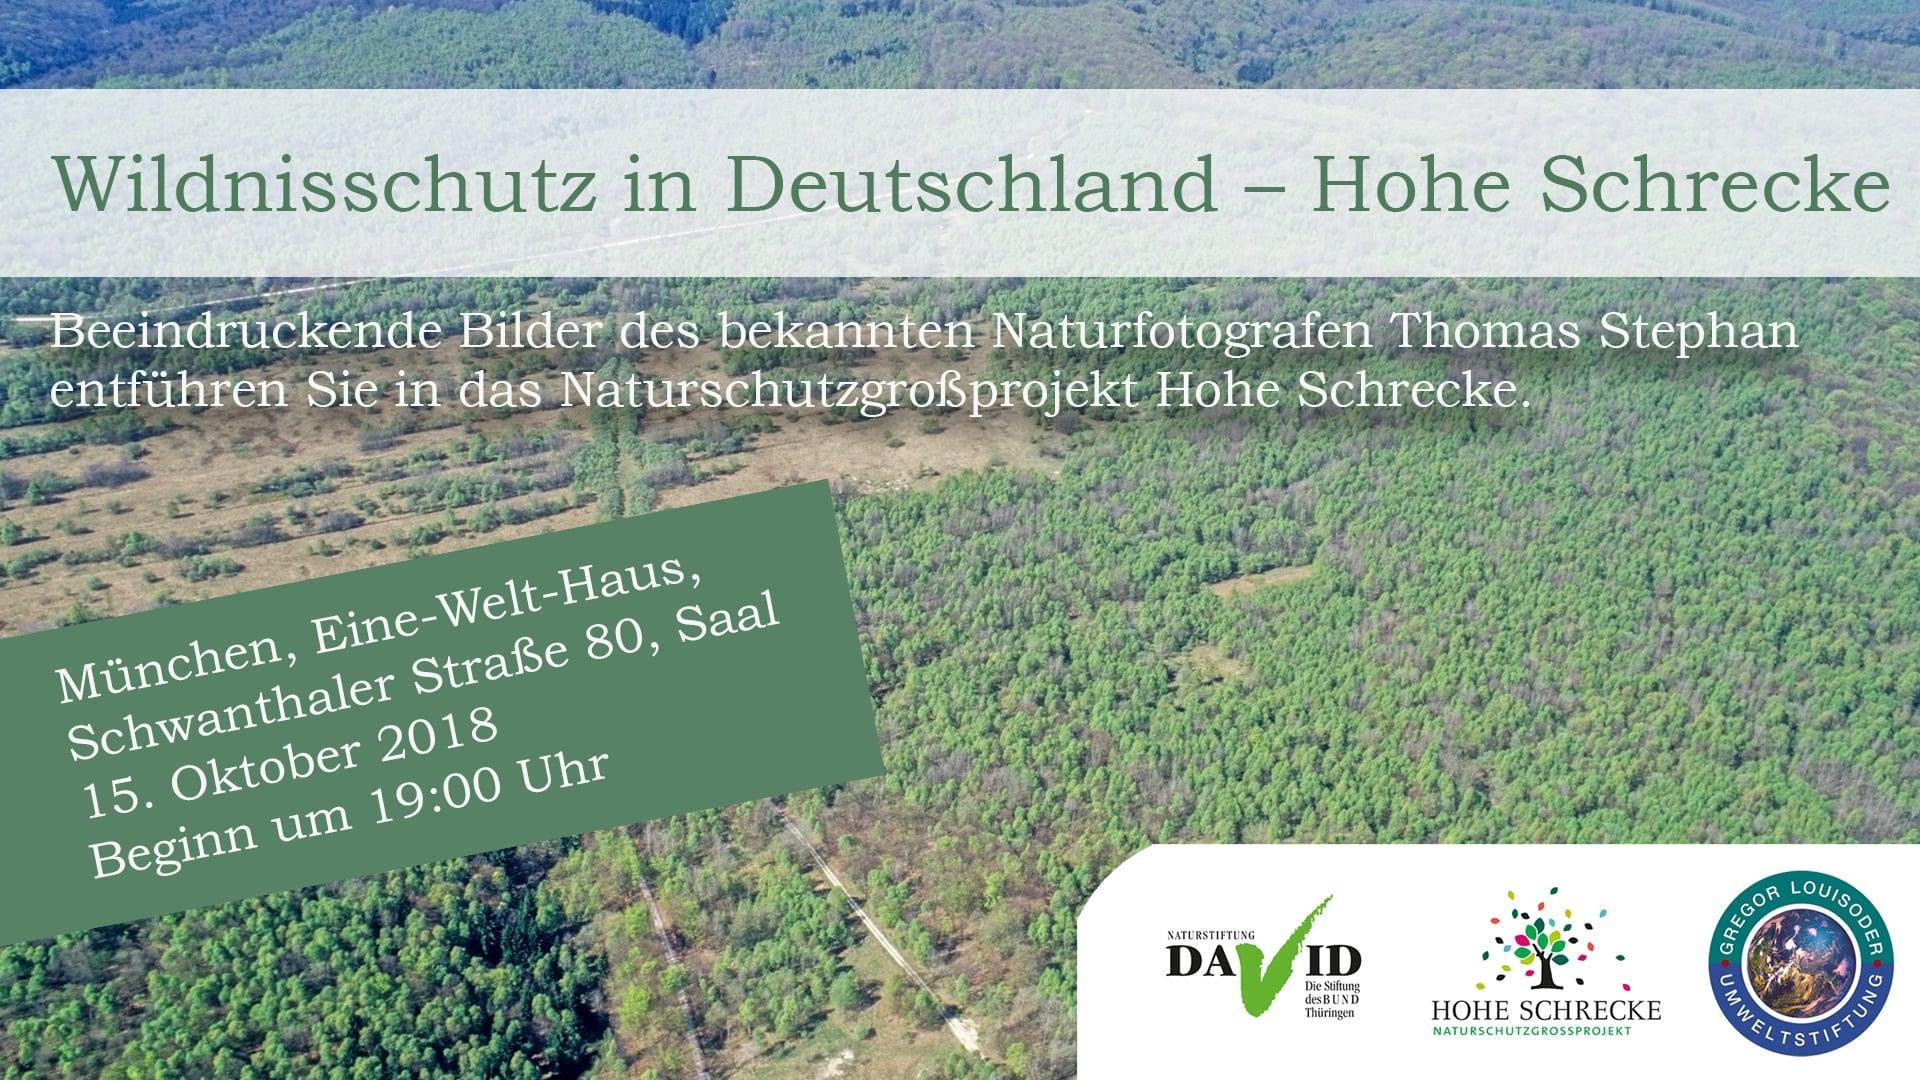 Multivisionsabend – Naturschutzprojekt Hohe Schrecke 15.10.